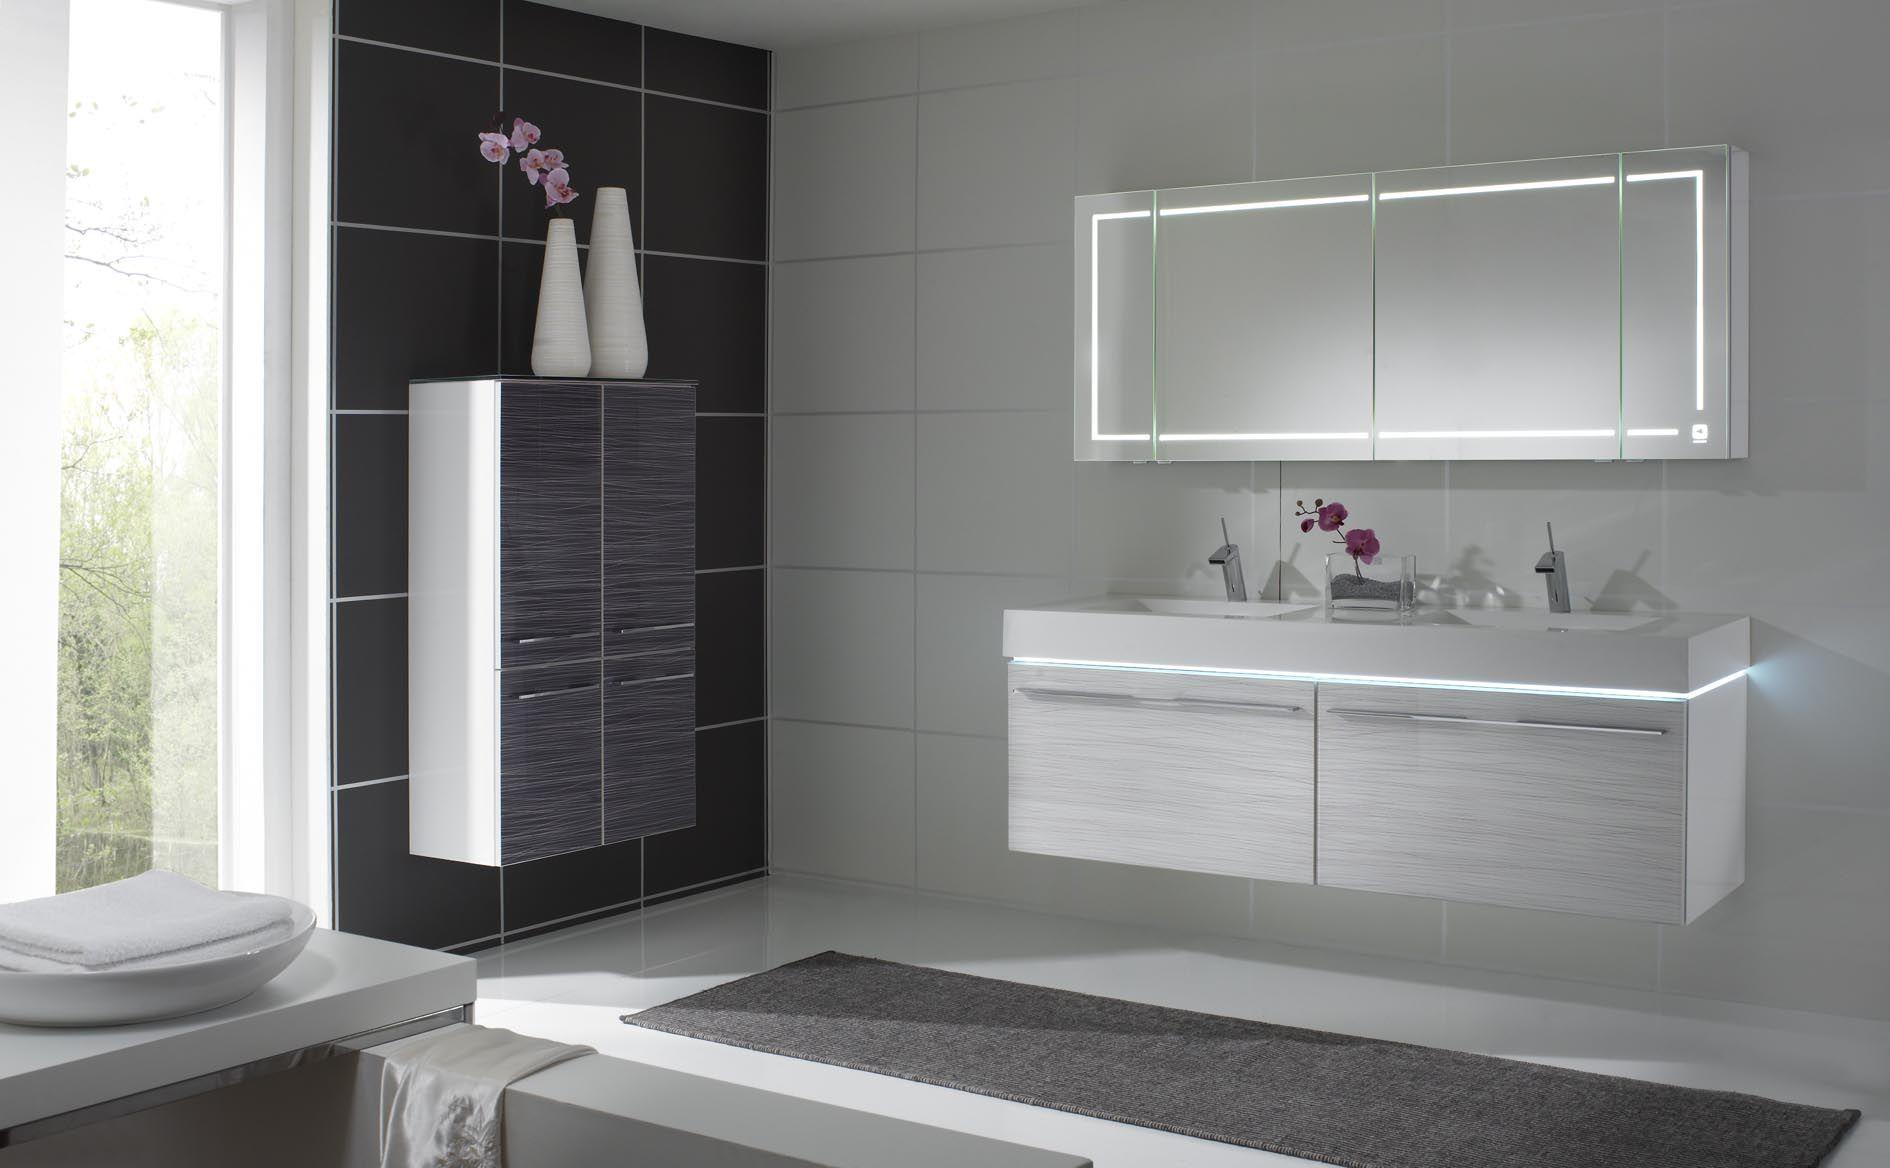 pelipal leonardo f3 led luxuri s pinterest badezimmer. Black Bedroom Furniture Sets. Home Design Ideas